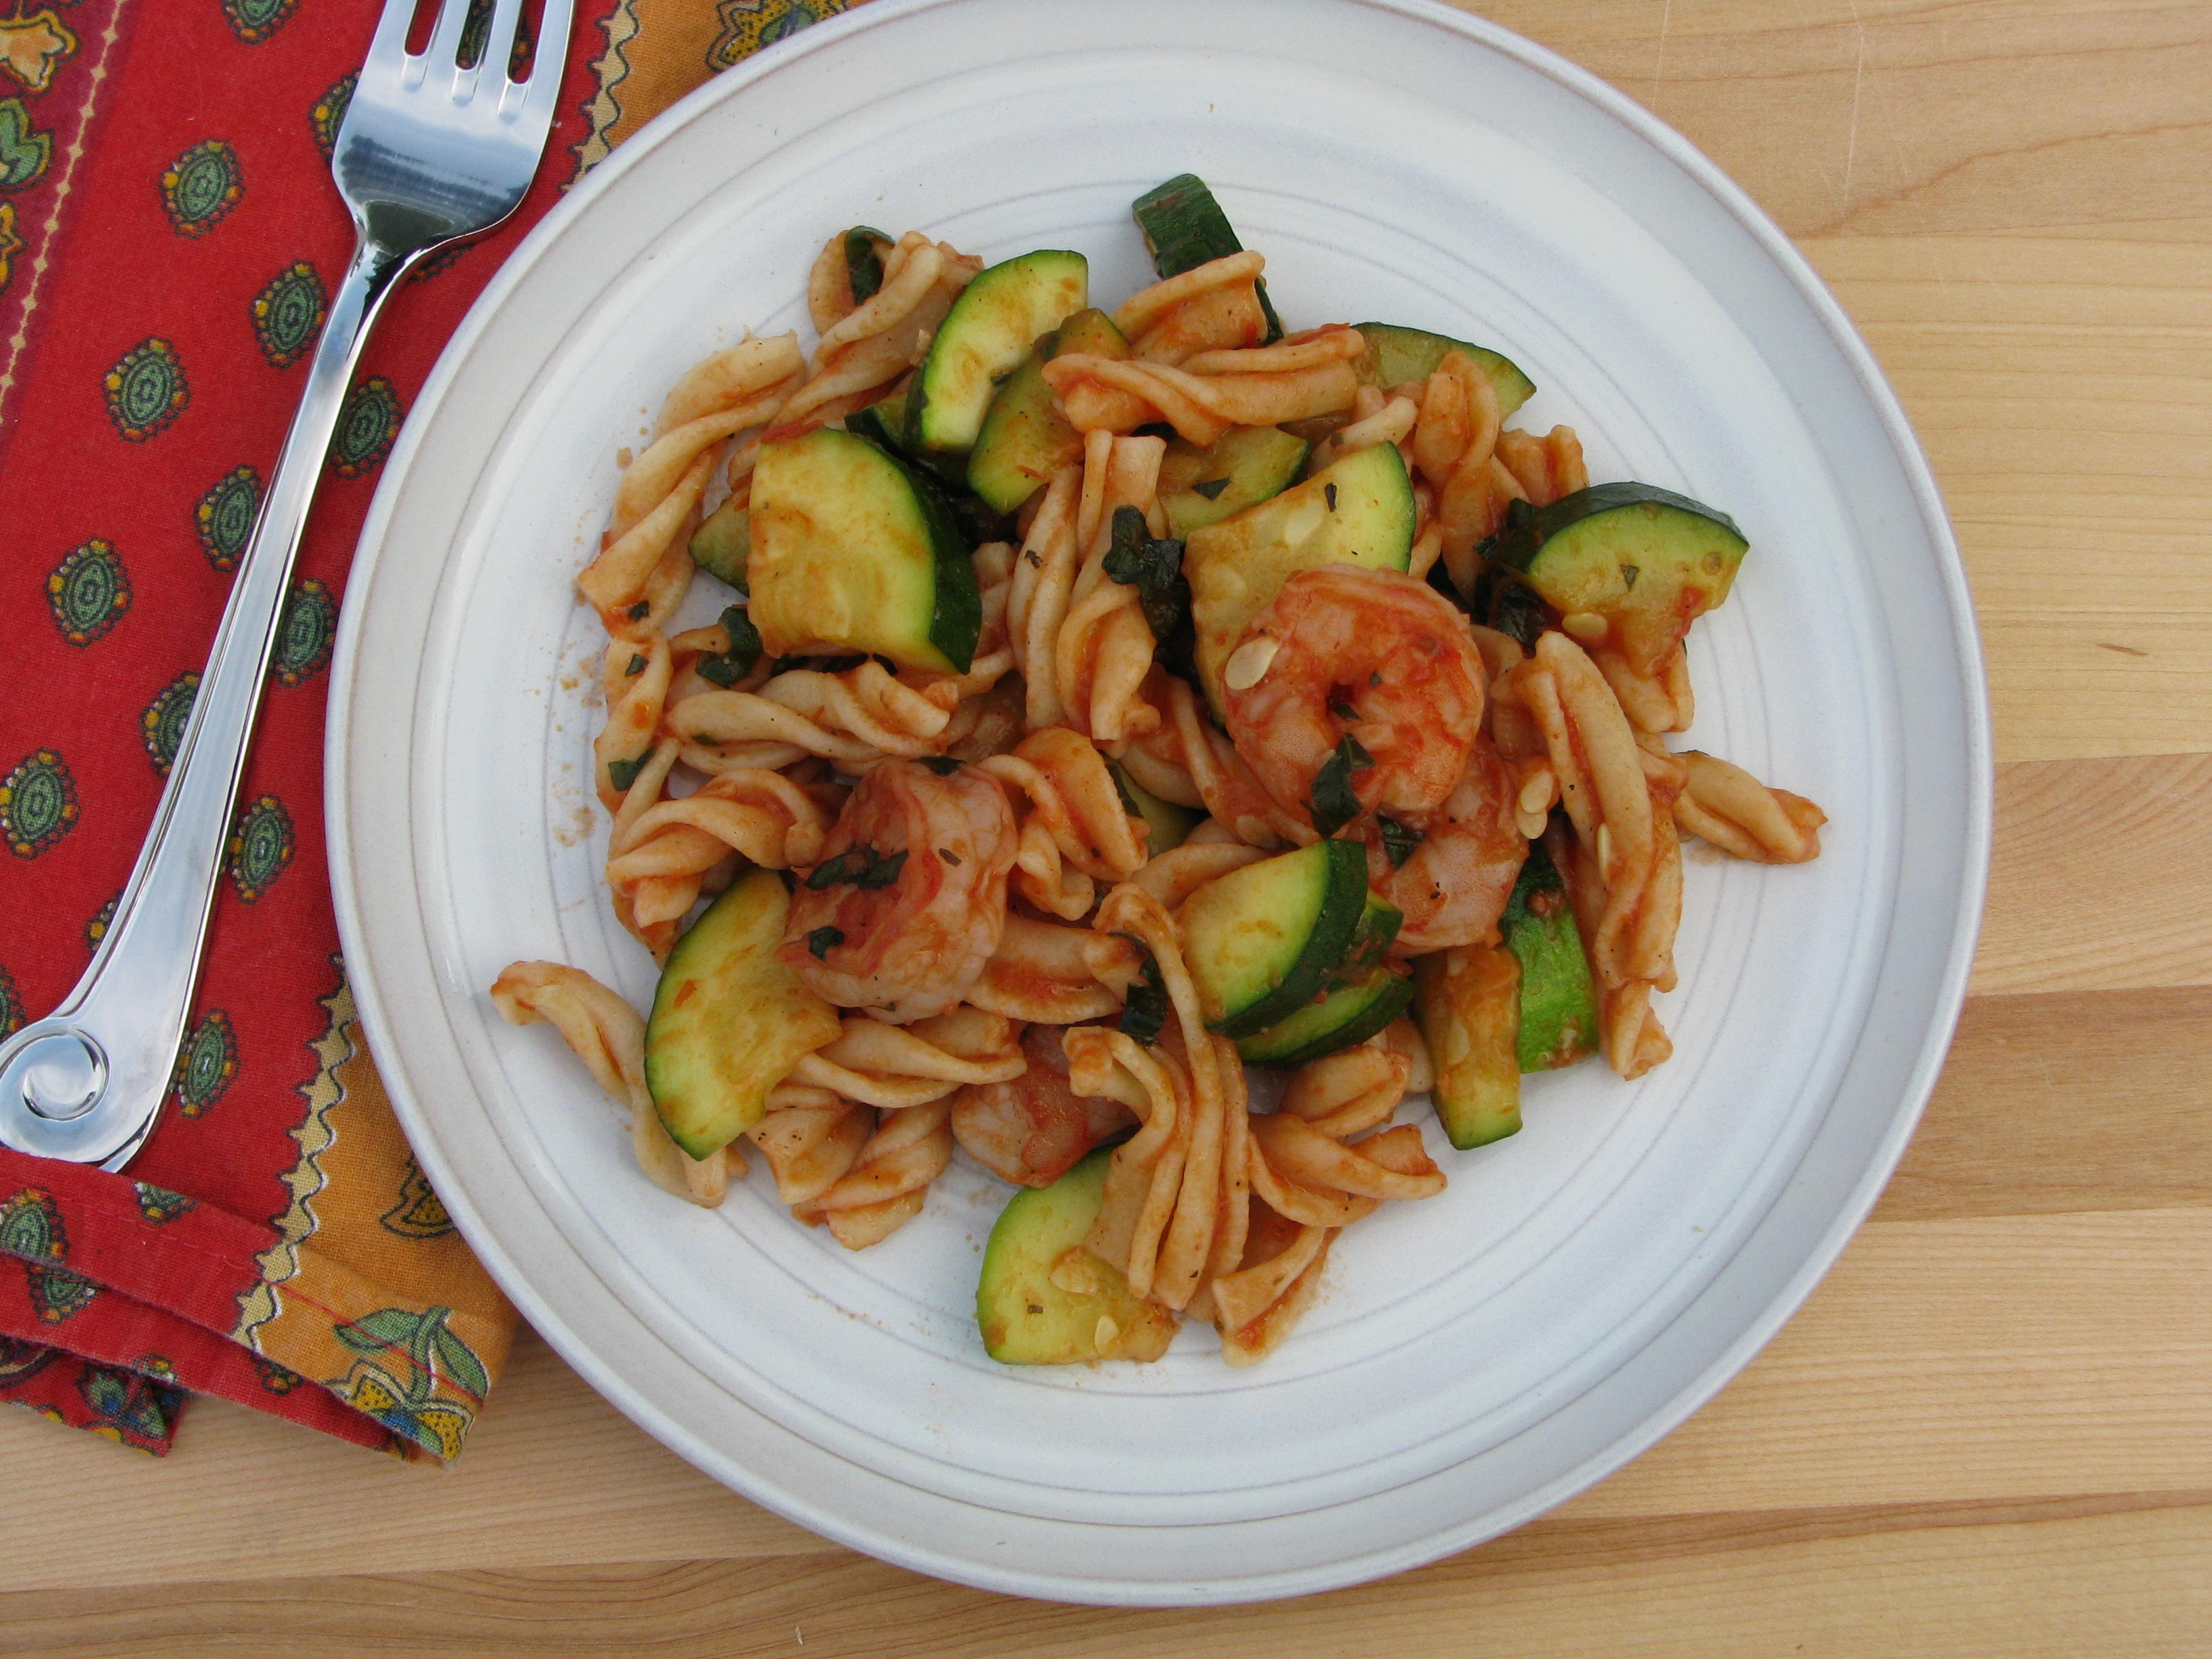 Blue apron zucchini - Blue Apron Zucchini 45